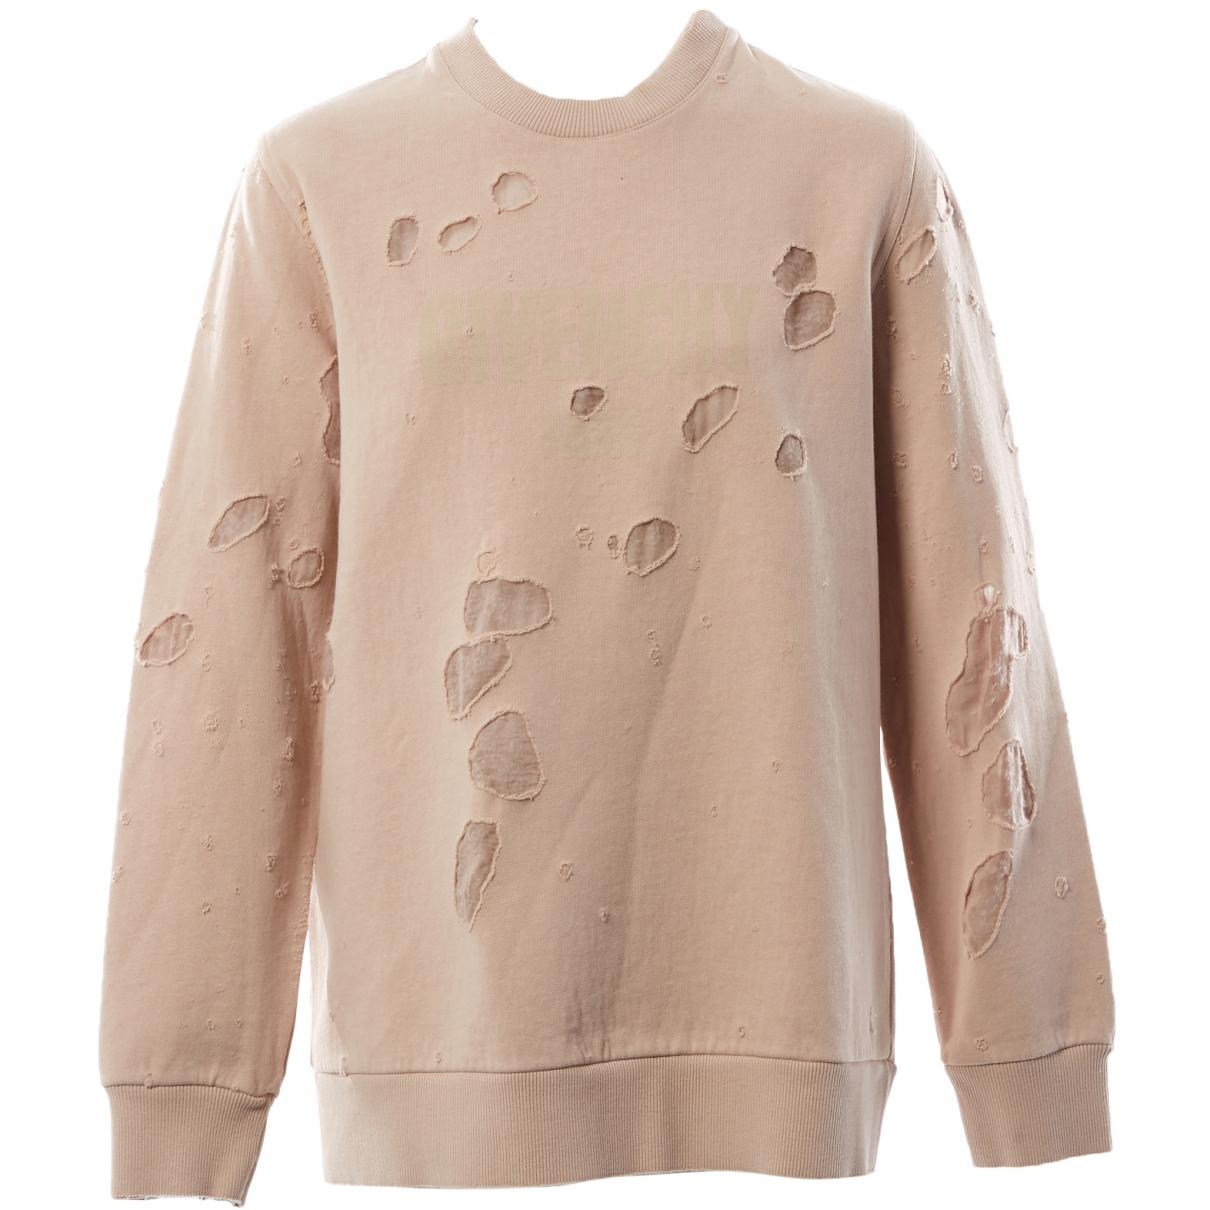 Givenchy \N Beige Cotton Knitwear for Women M International